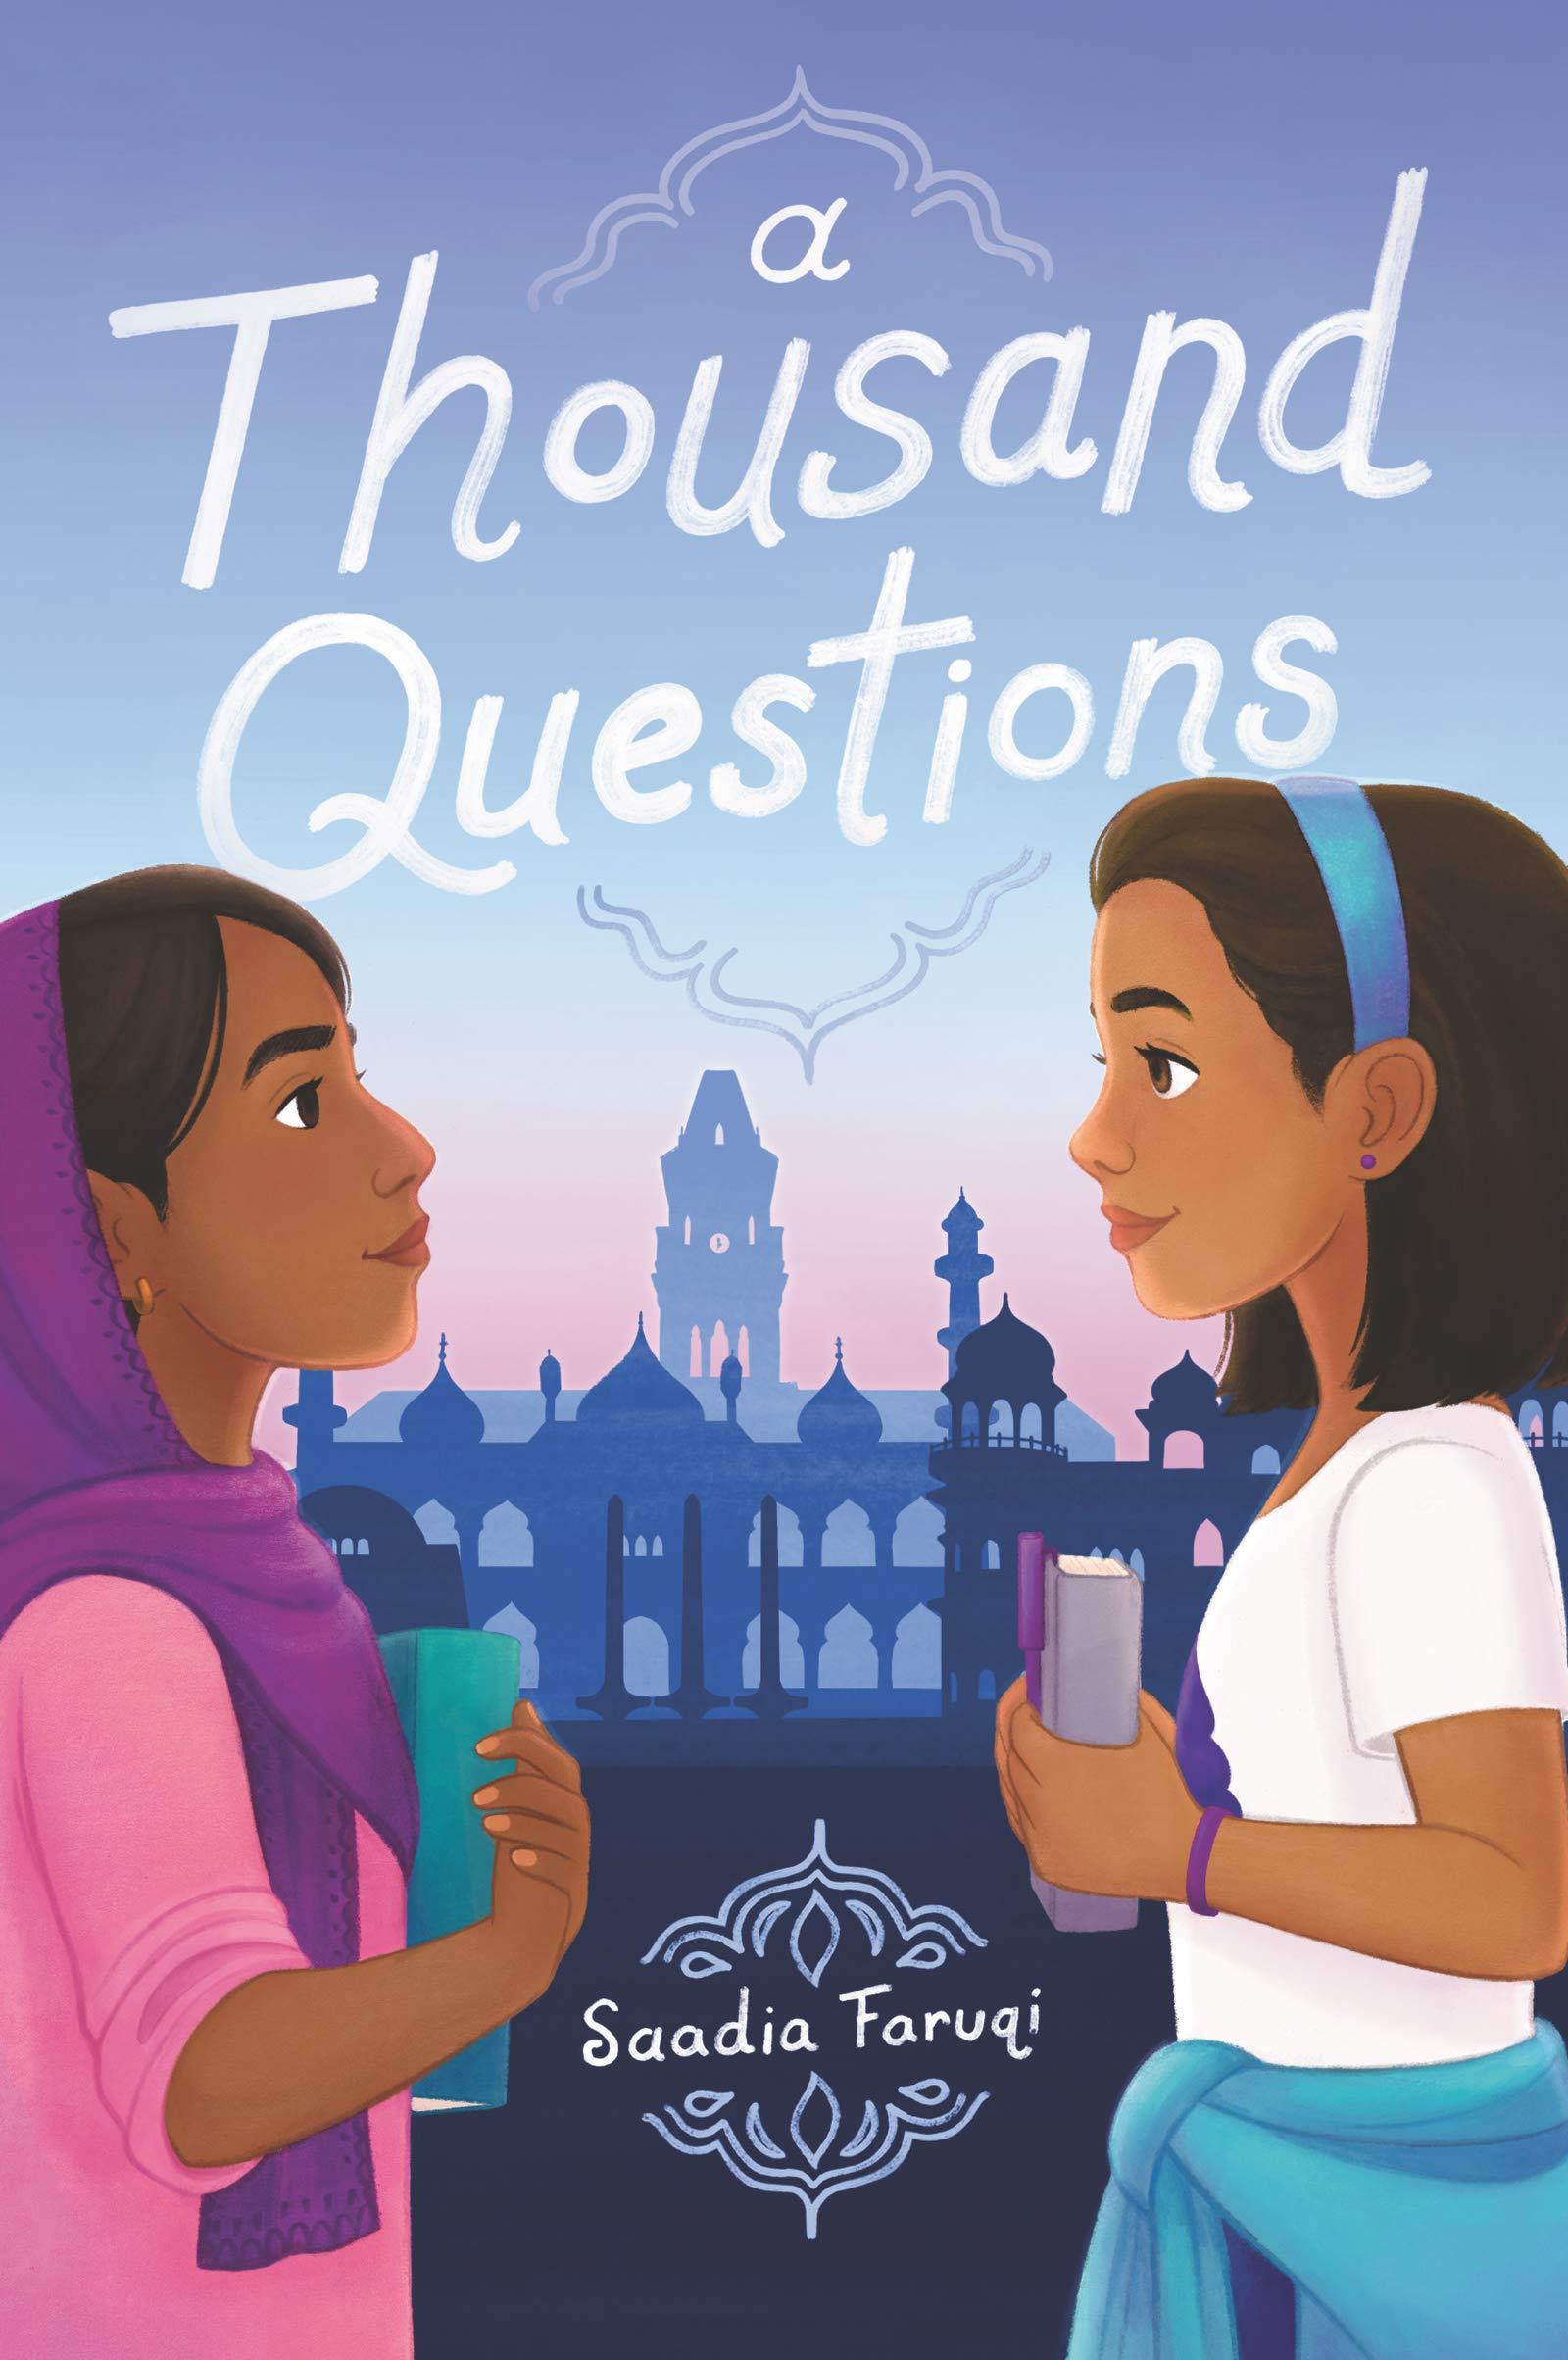 A Thousand Questions by Saadia Faruqi